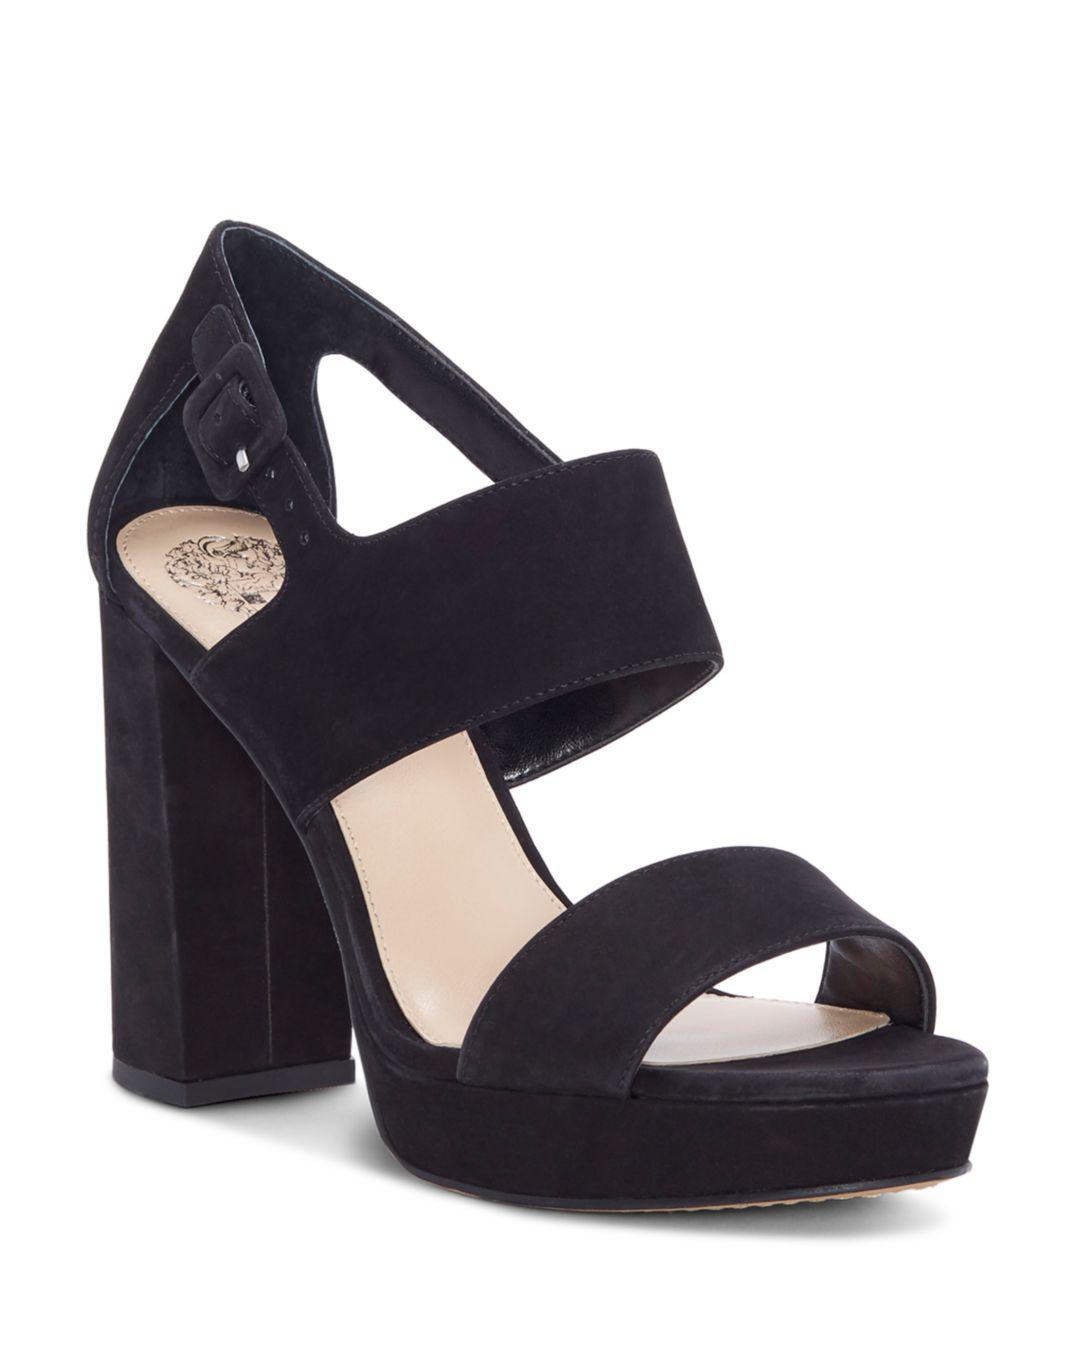 bd200c196b1 Lyst - Vince Camuto Women s Jayvid Suede Platform Sandals in Black ...